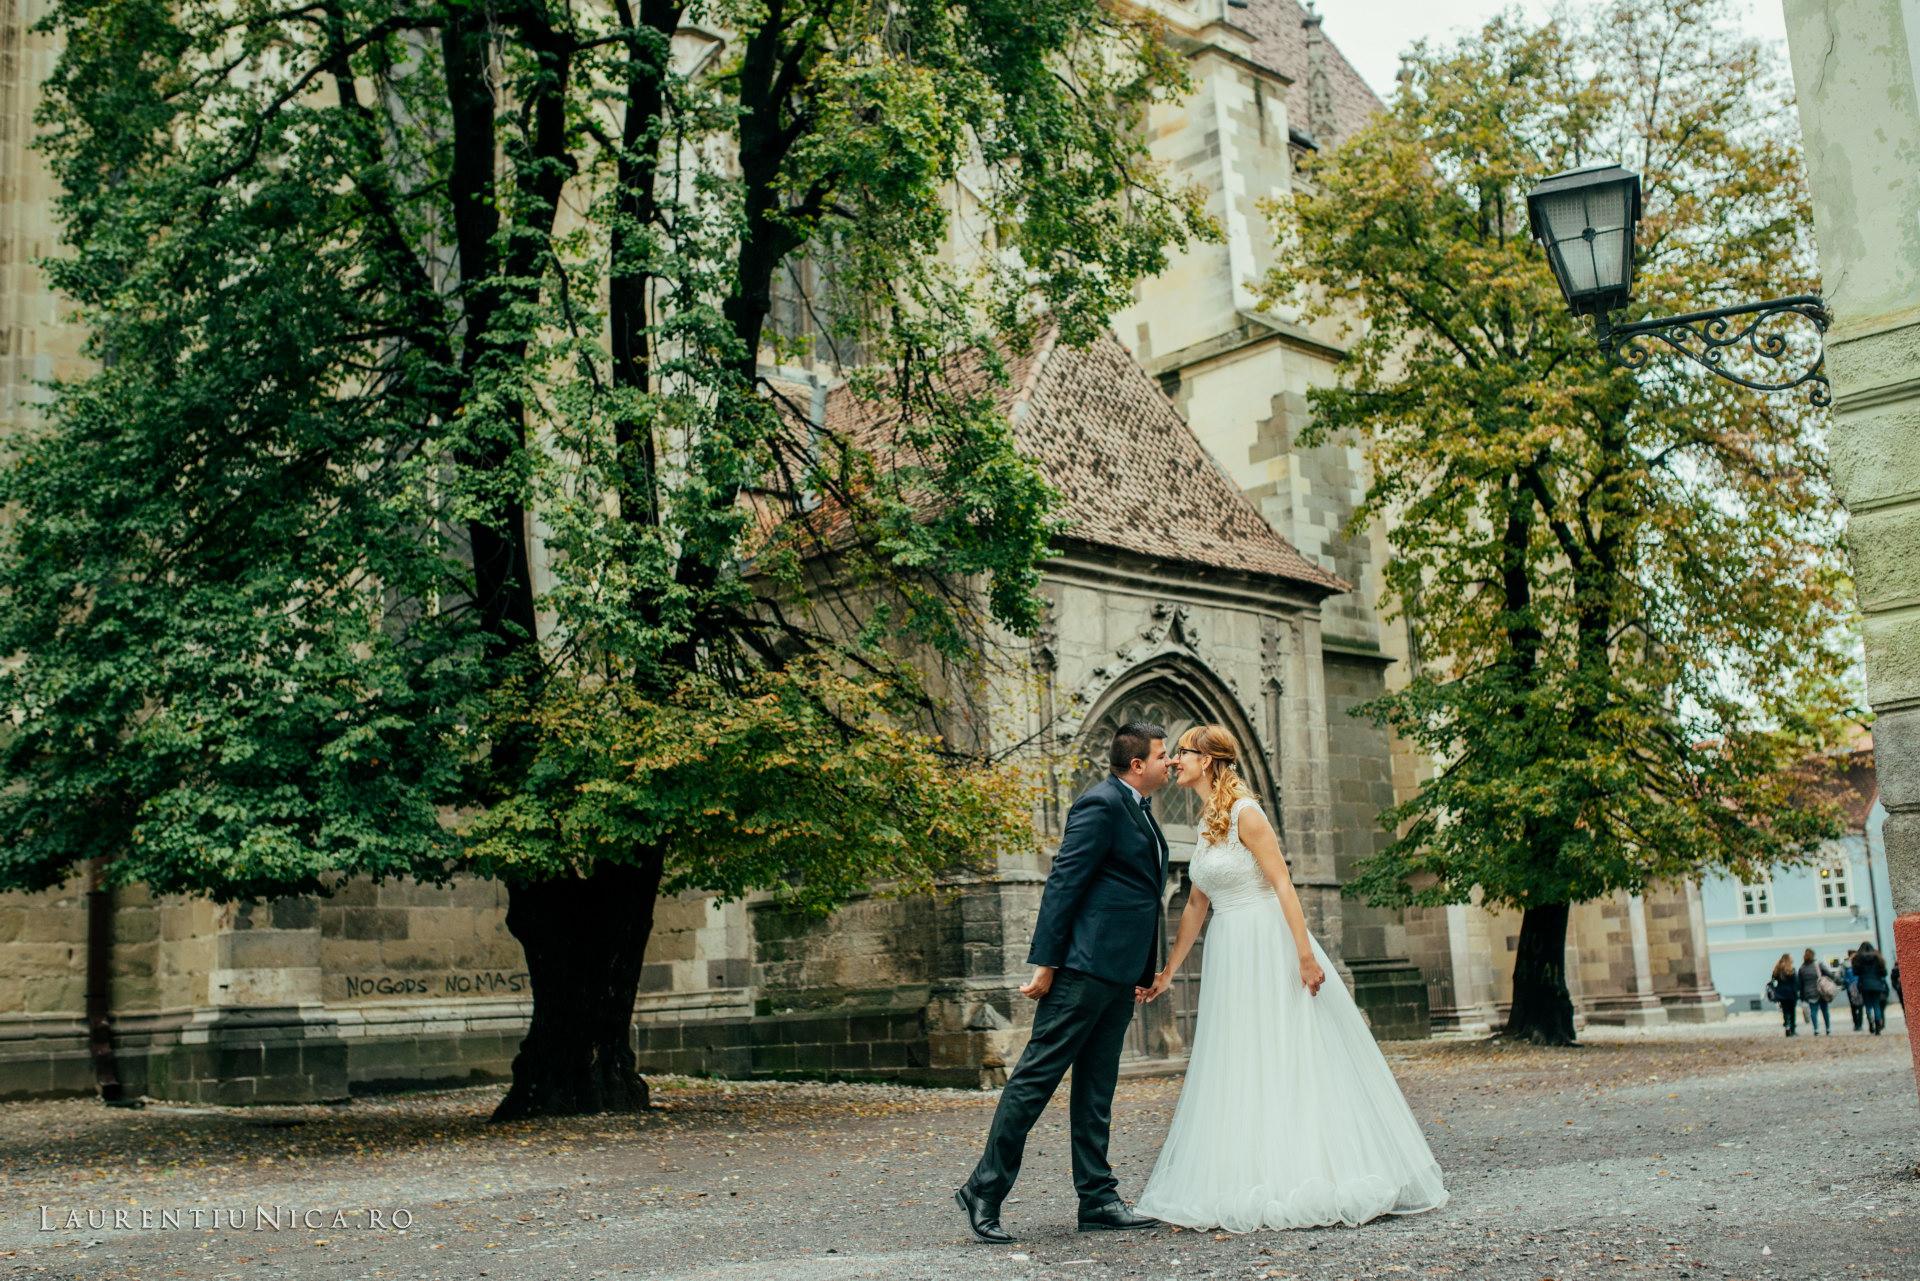 iulia-si-cosmin-fotografii-after-wedding-brasov-laurentiu-nica13